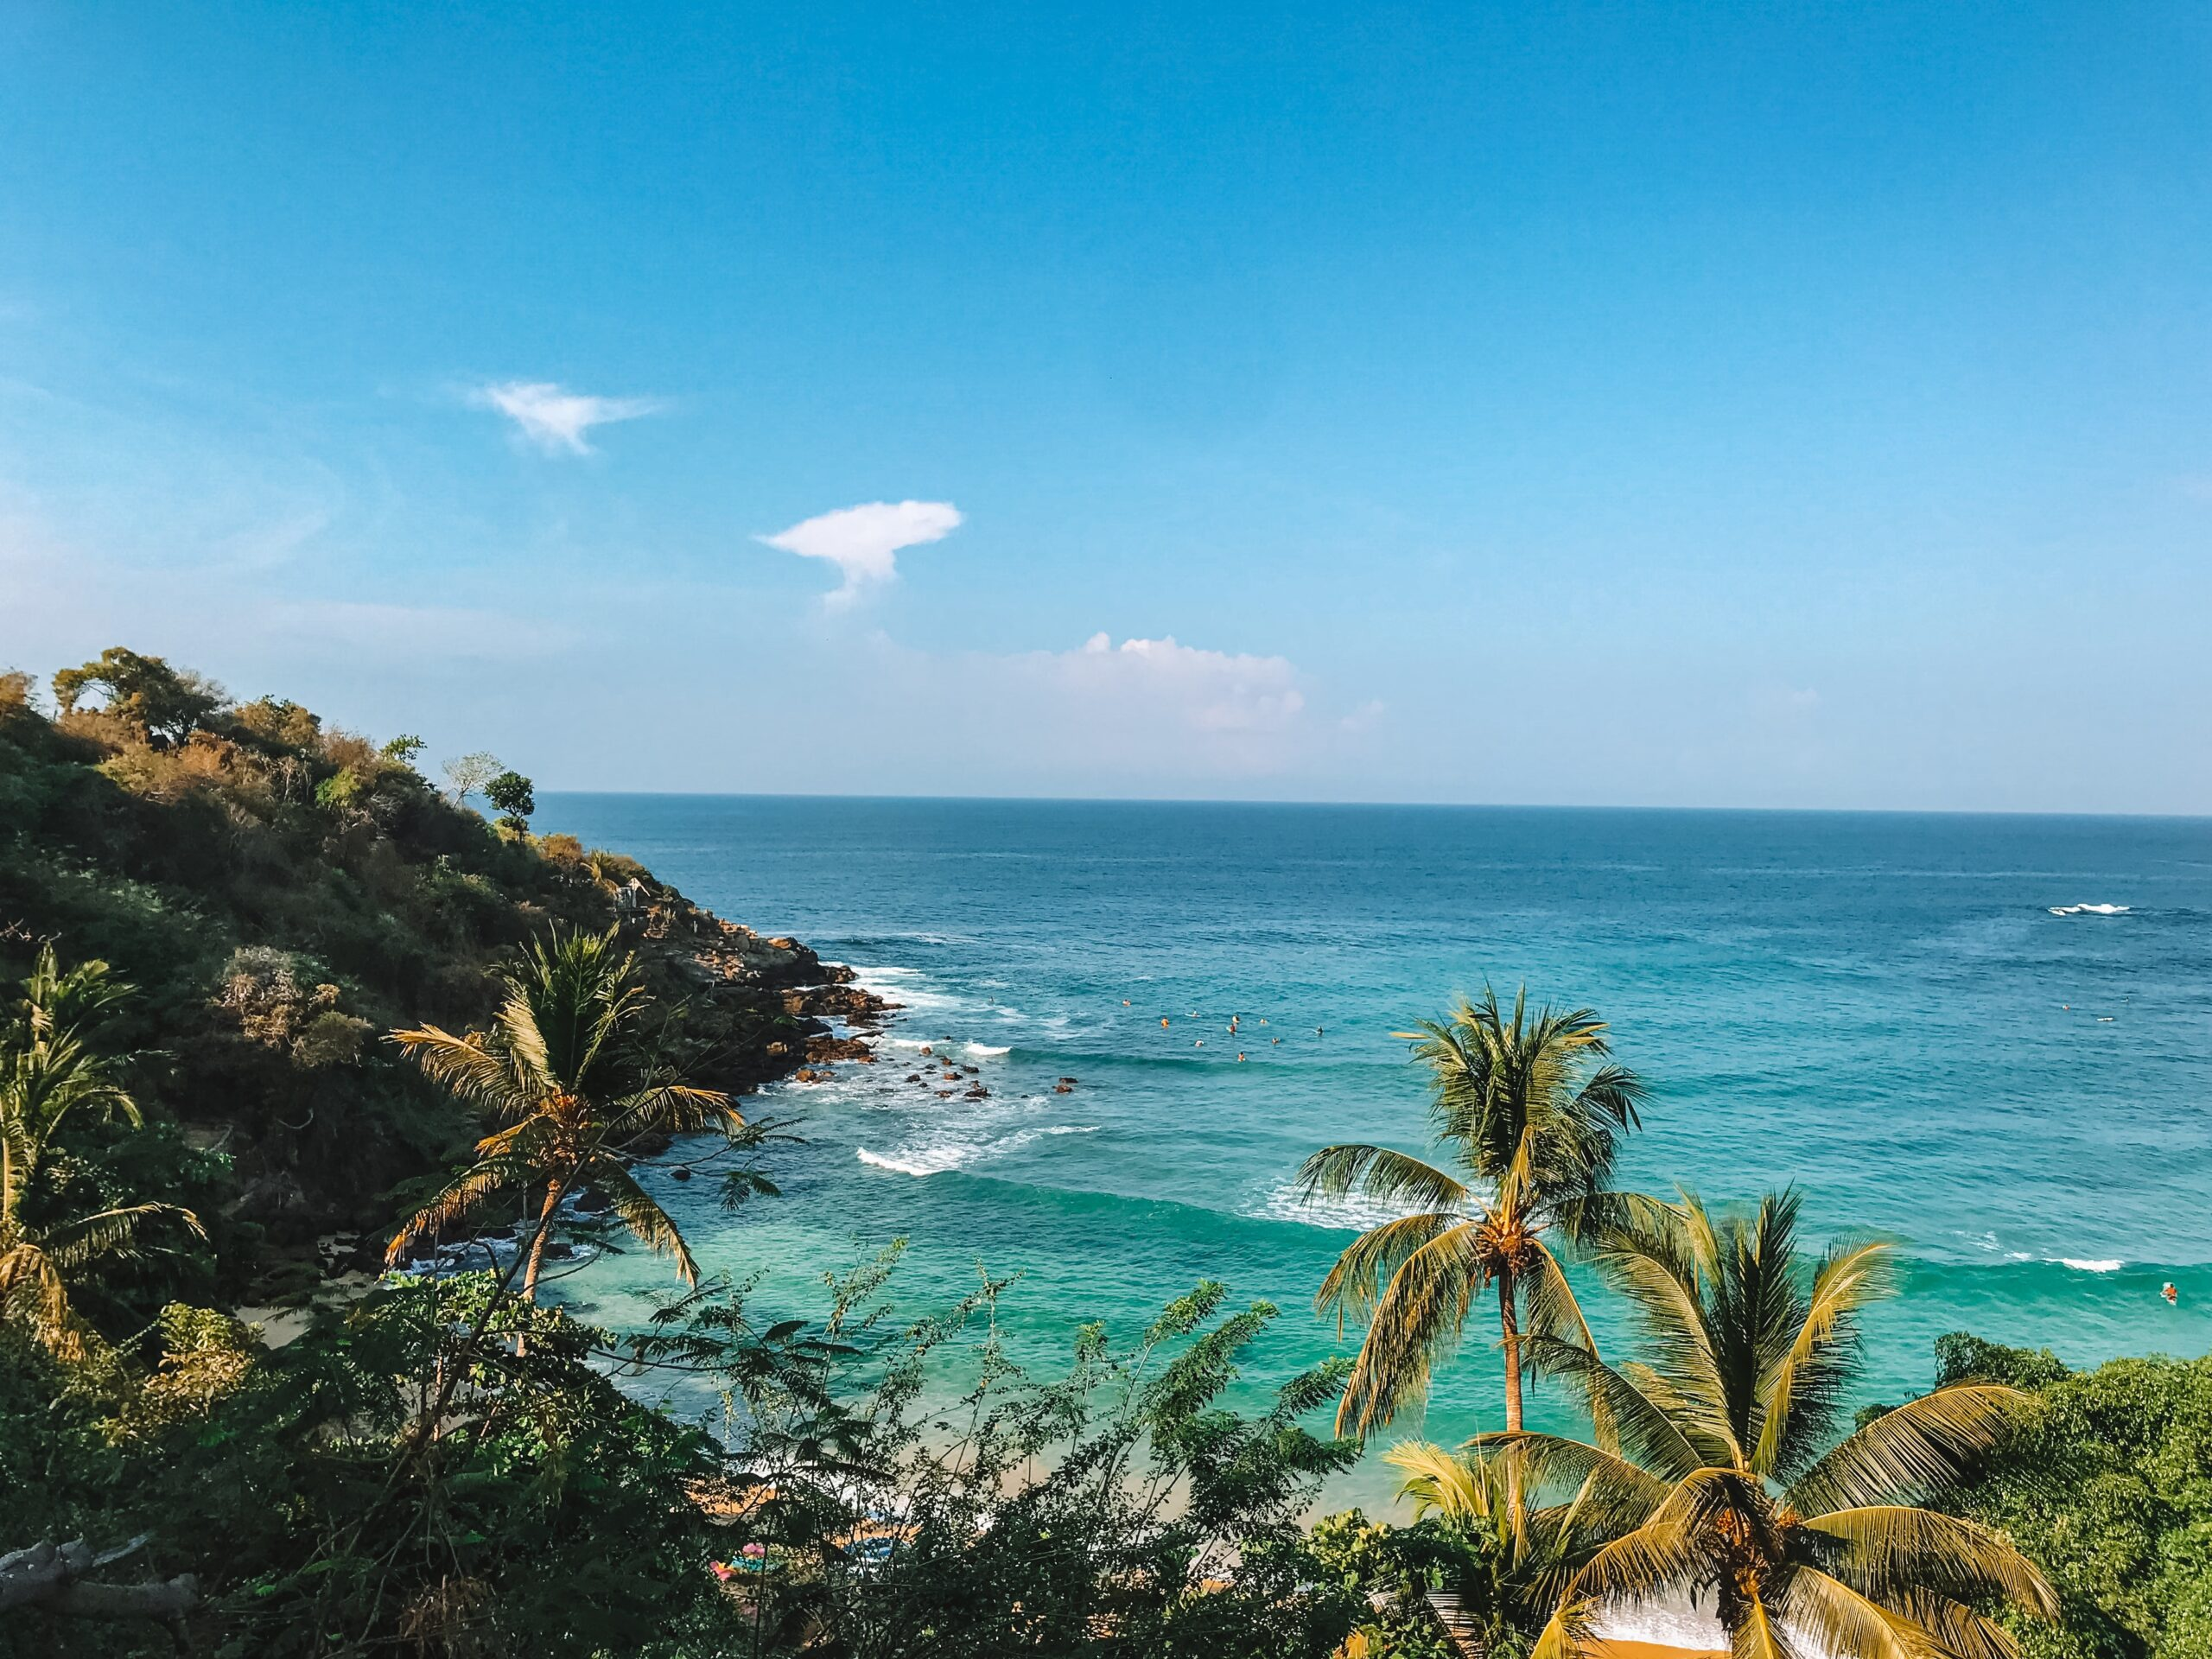 2 Days In Puerto Escondido Itinerary 2